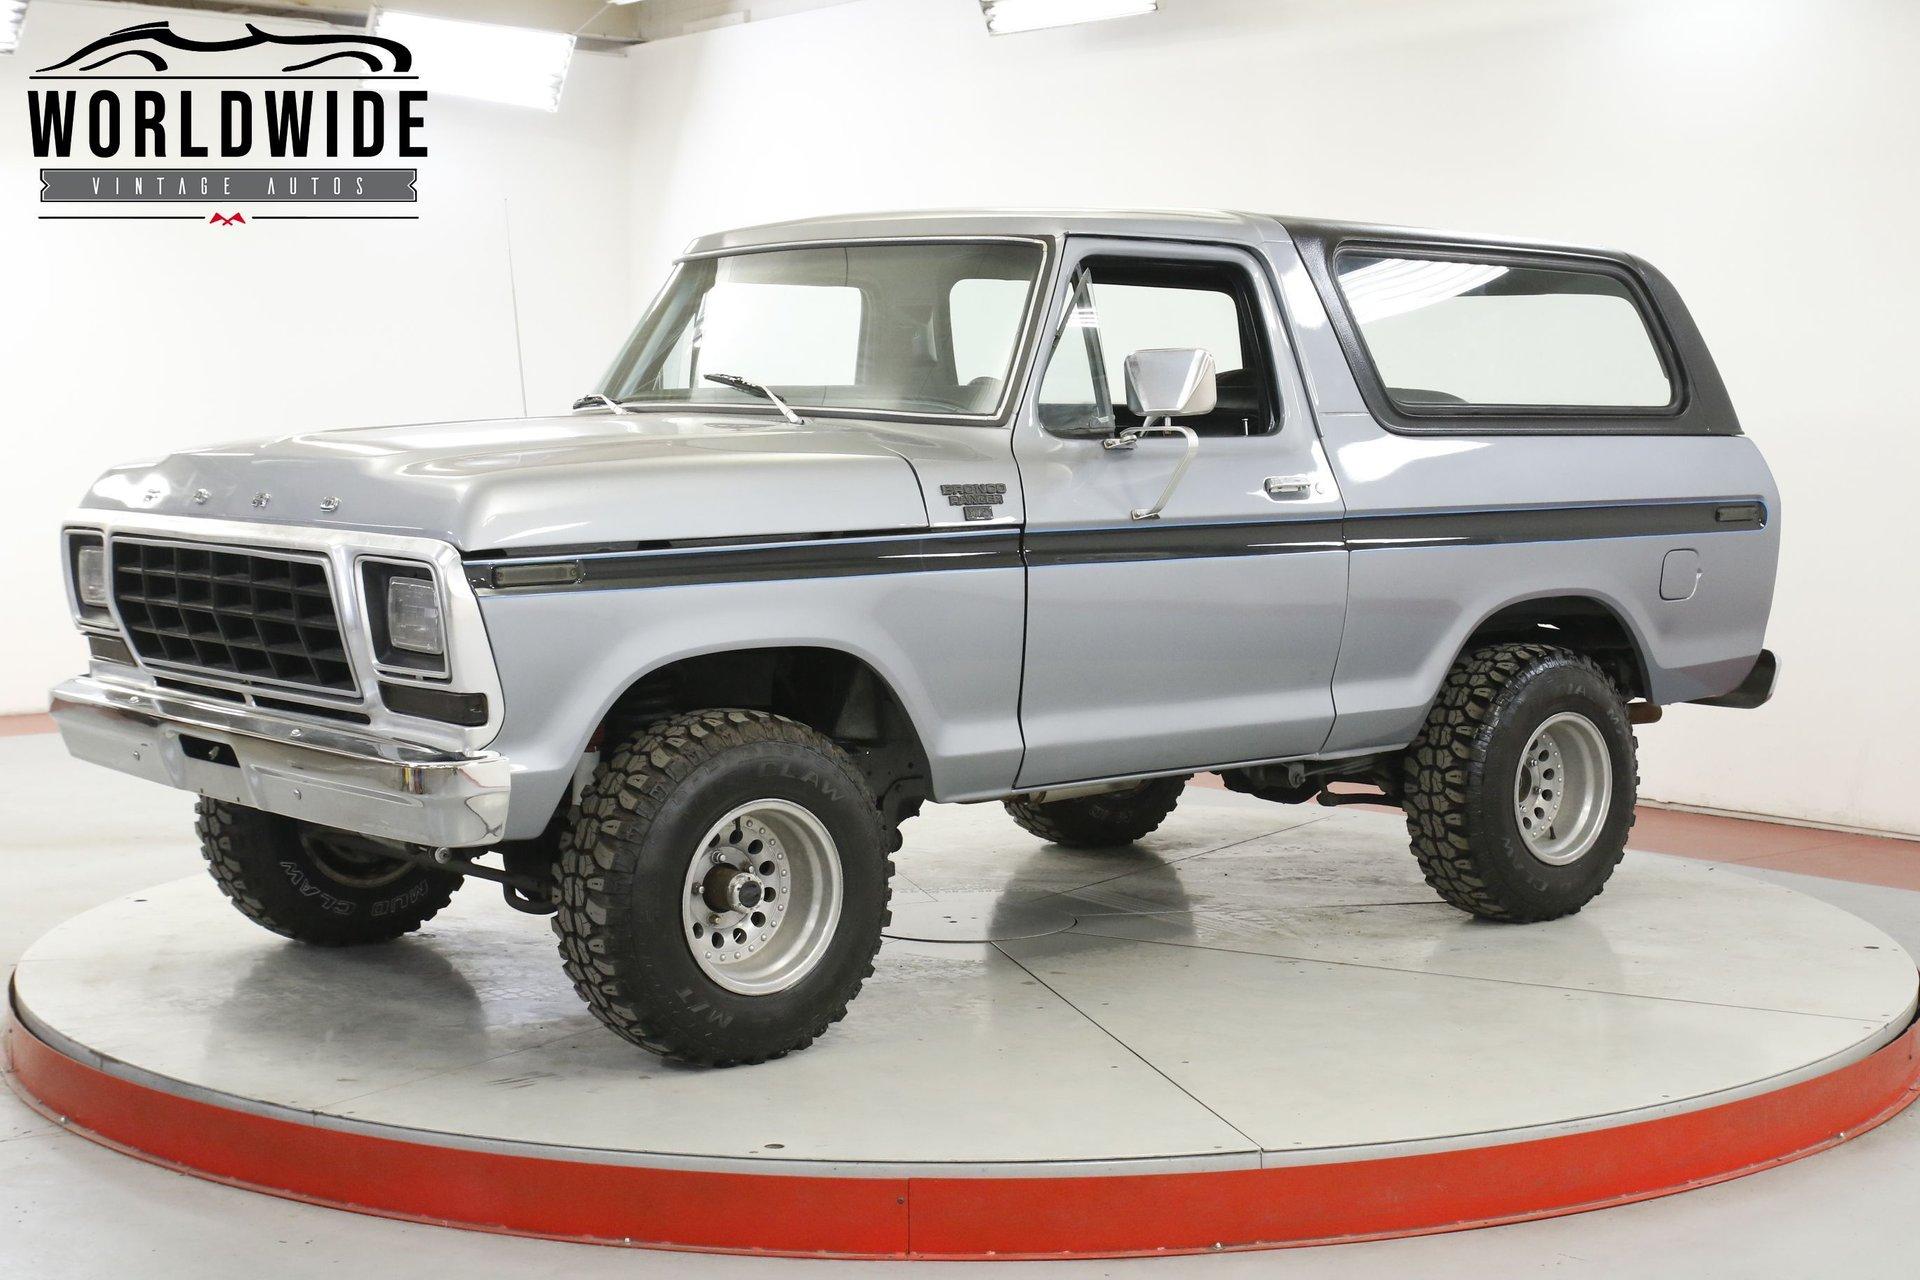 1978 Ford Bronco Worldwide Vintage Autos